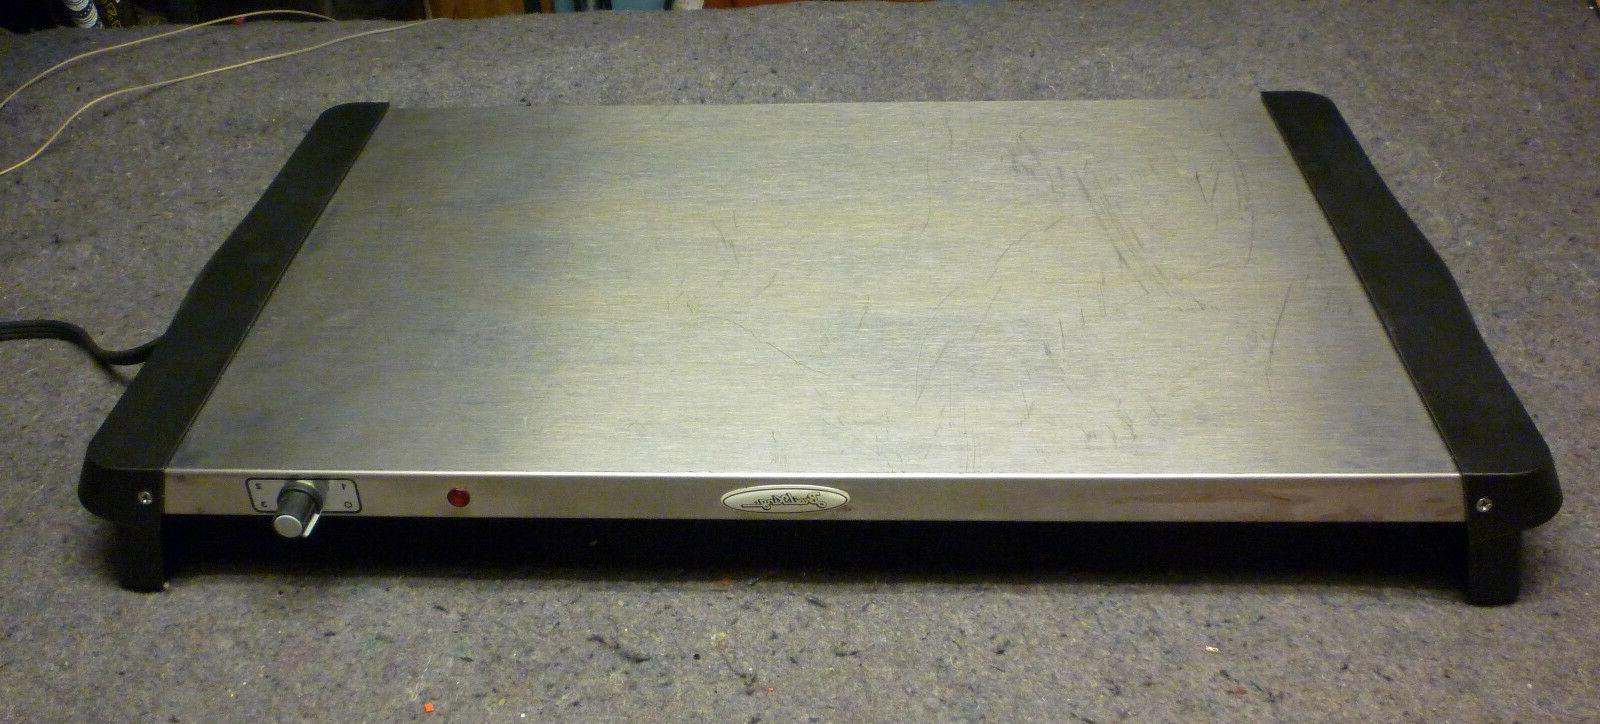 Broil King NWT-1S Professional 300-Watt Warming Tray, Stainl